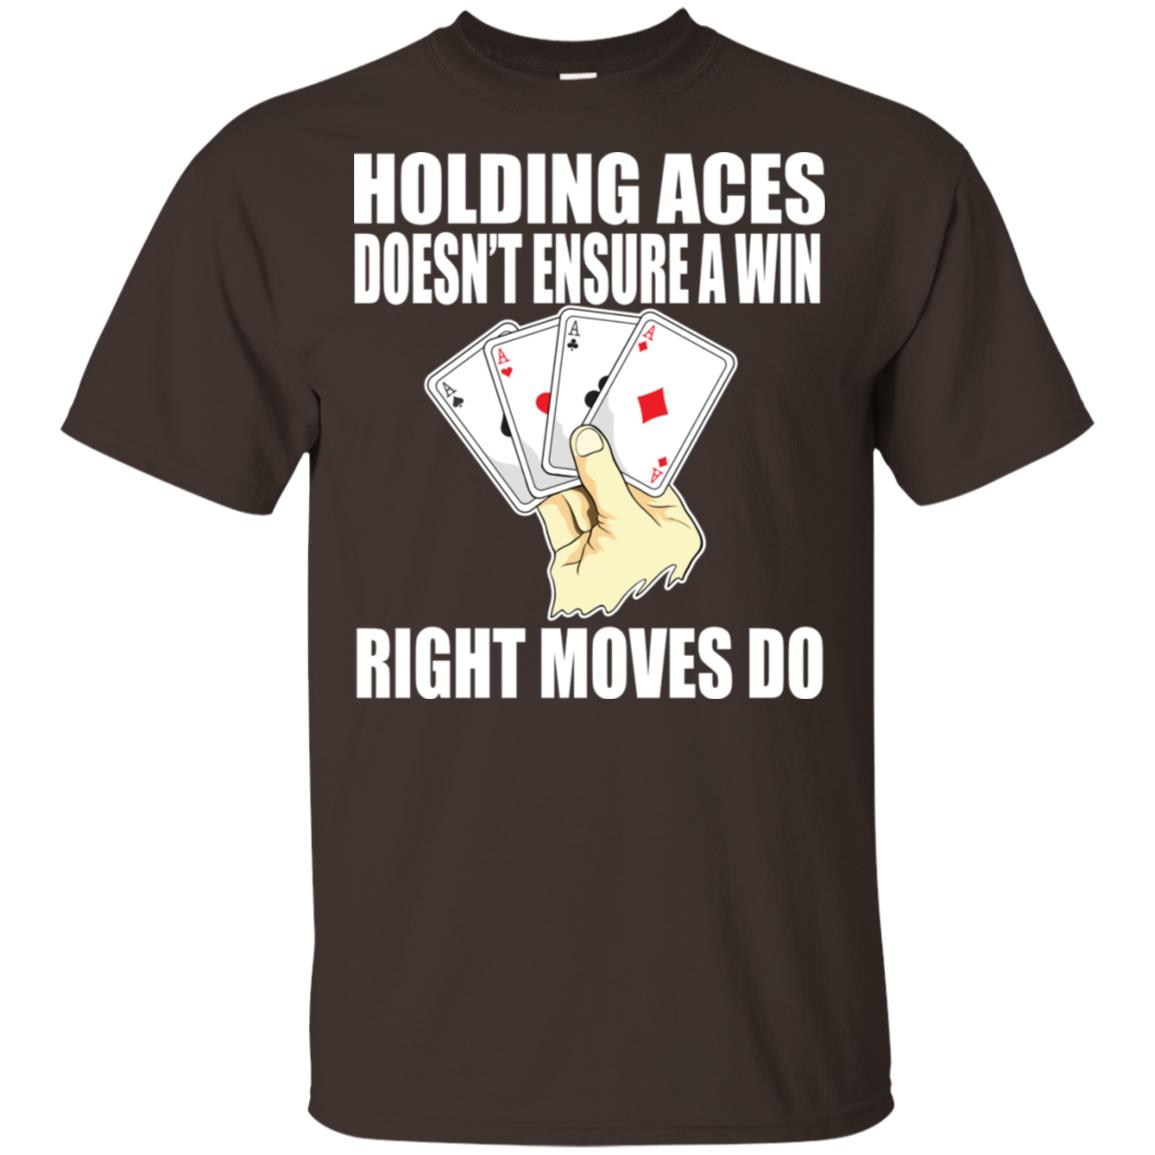 Holding Aces Playing Cards Sayings Unisex Short Sleeve